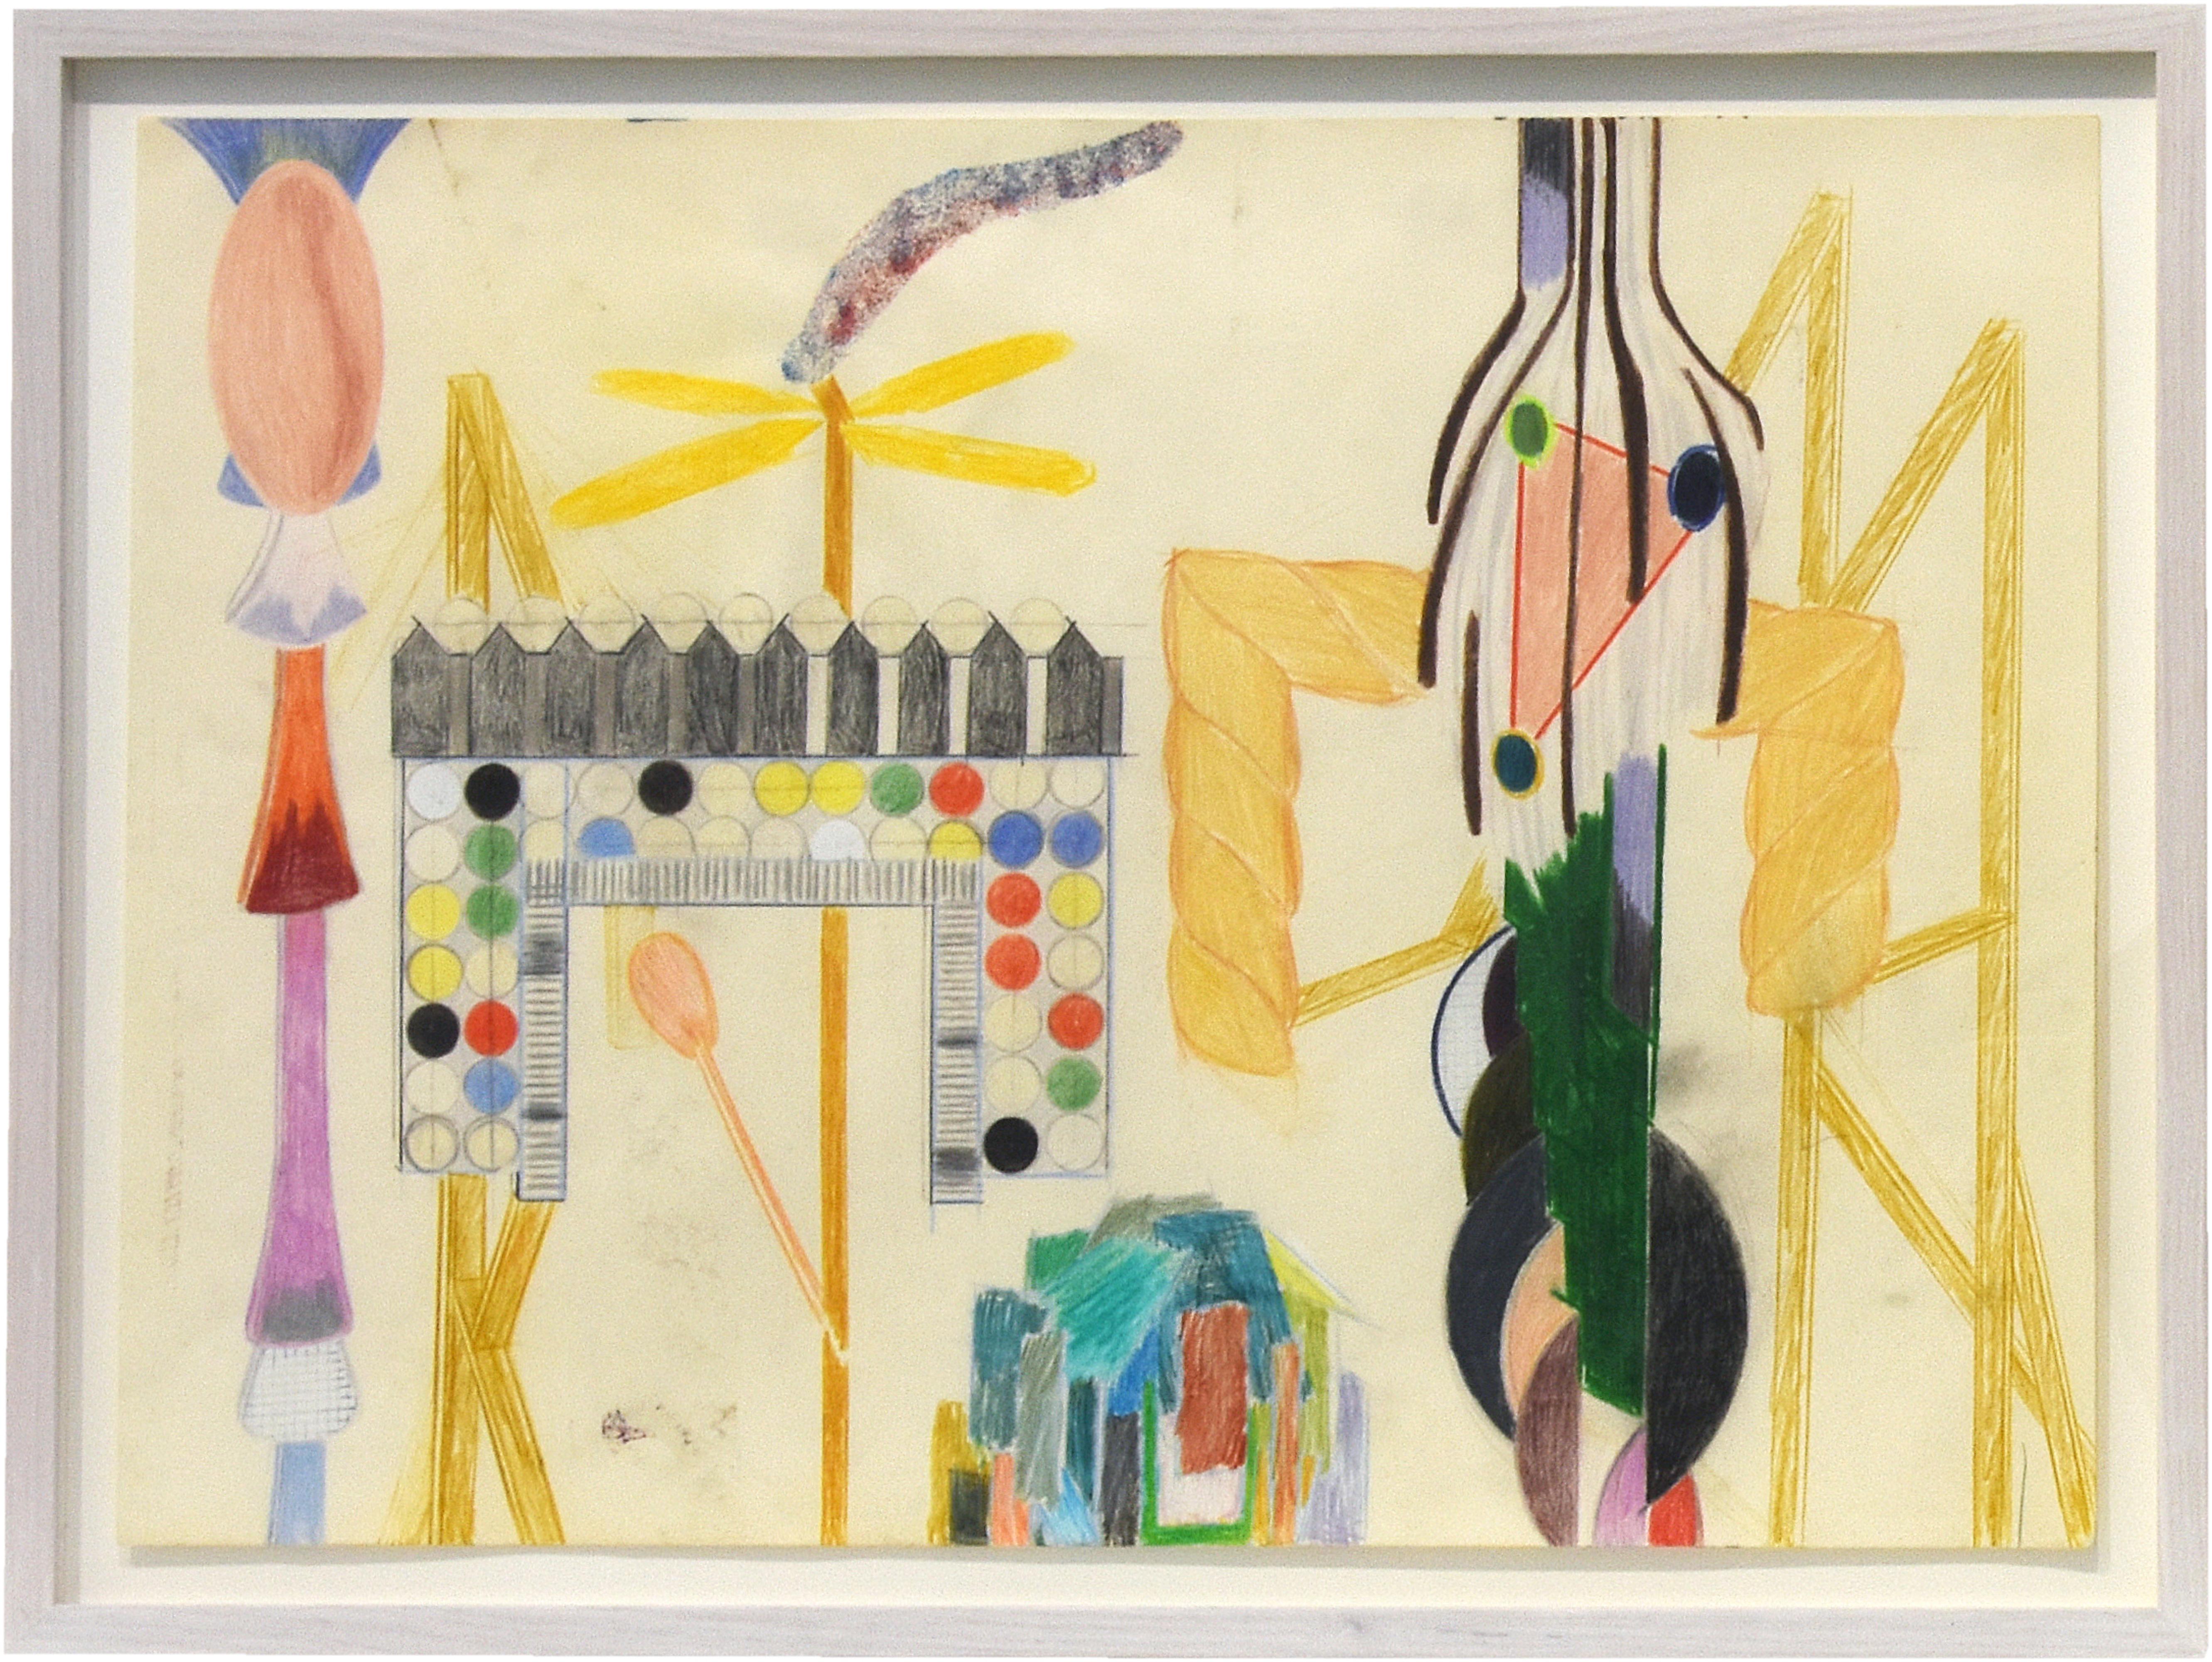 Galerie Barbara Thumm \ Anne K.E.: Untitled (AK.-11-031) \ Untitled (2011)